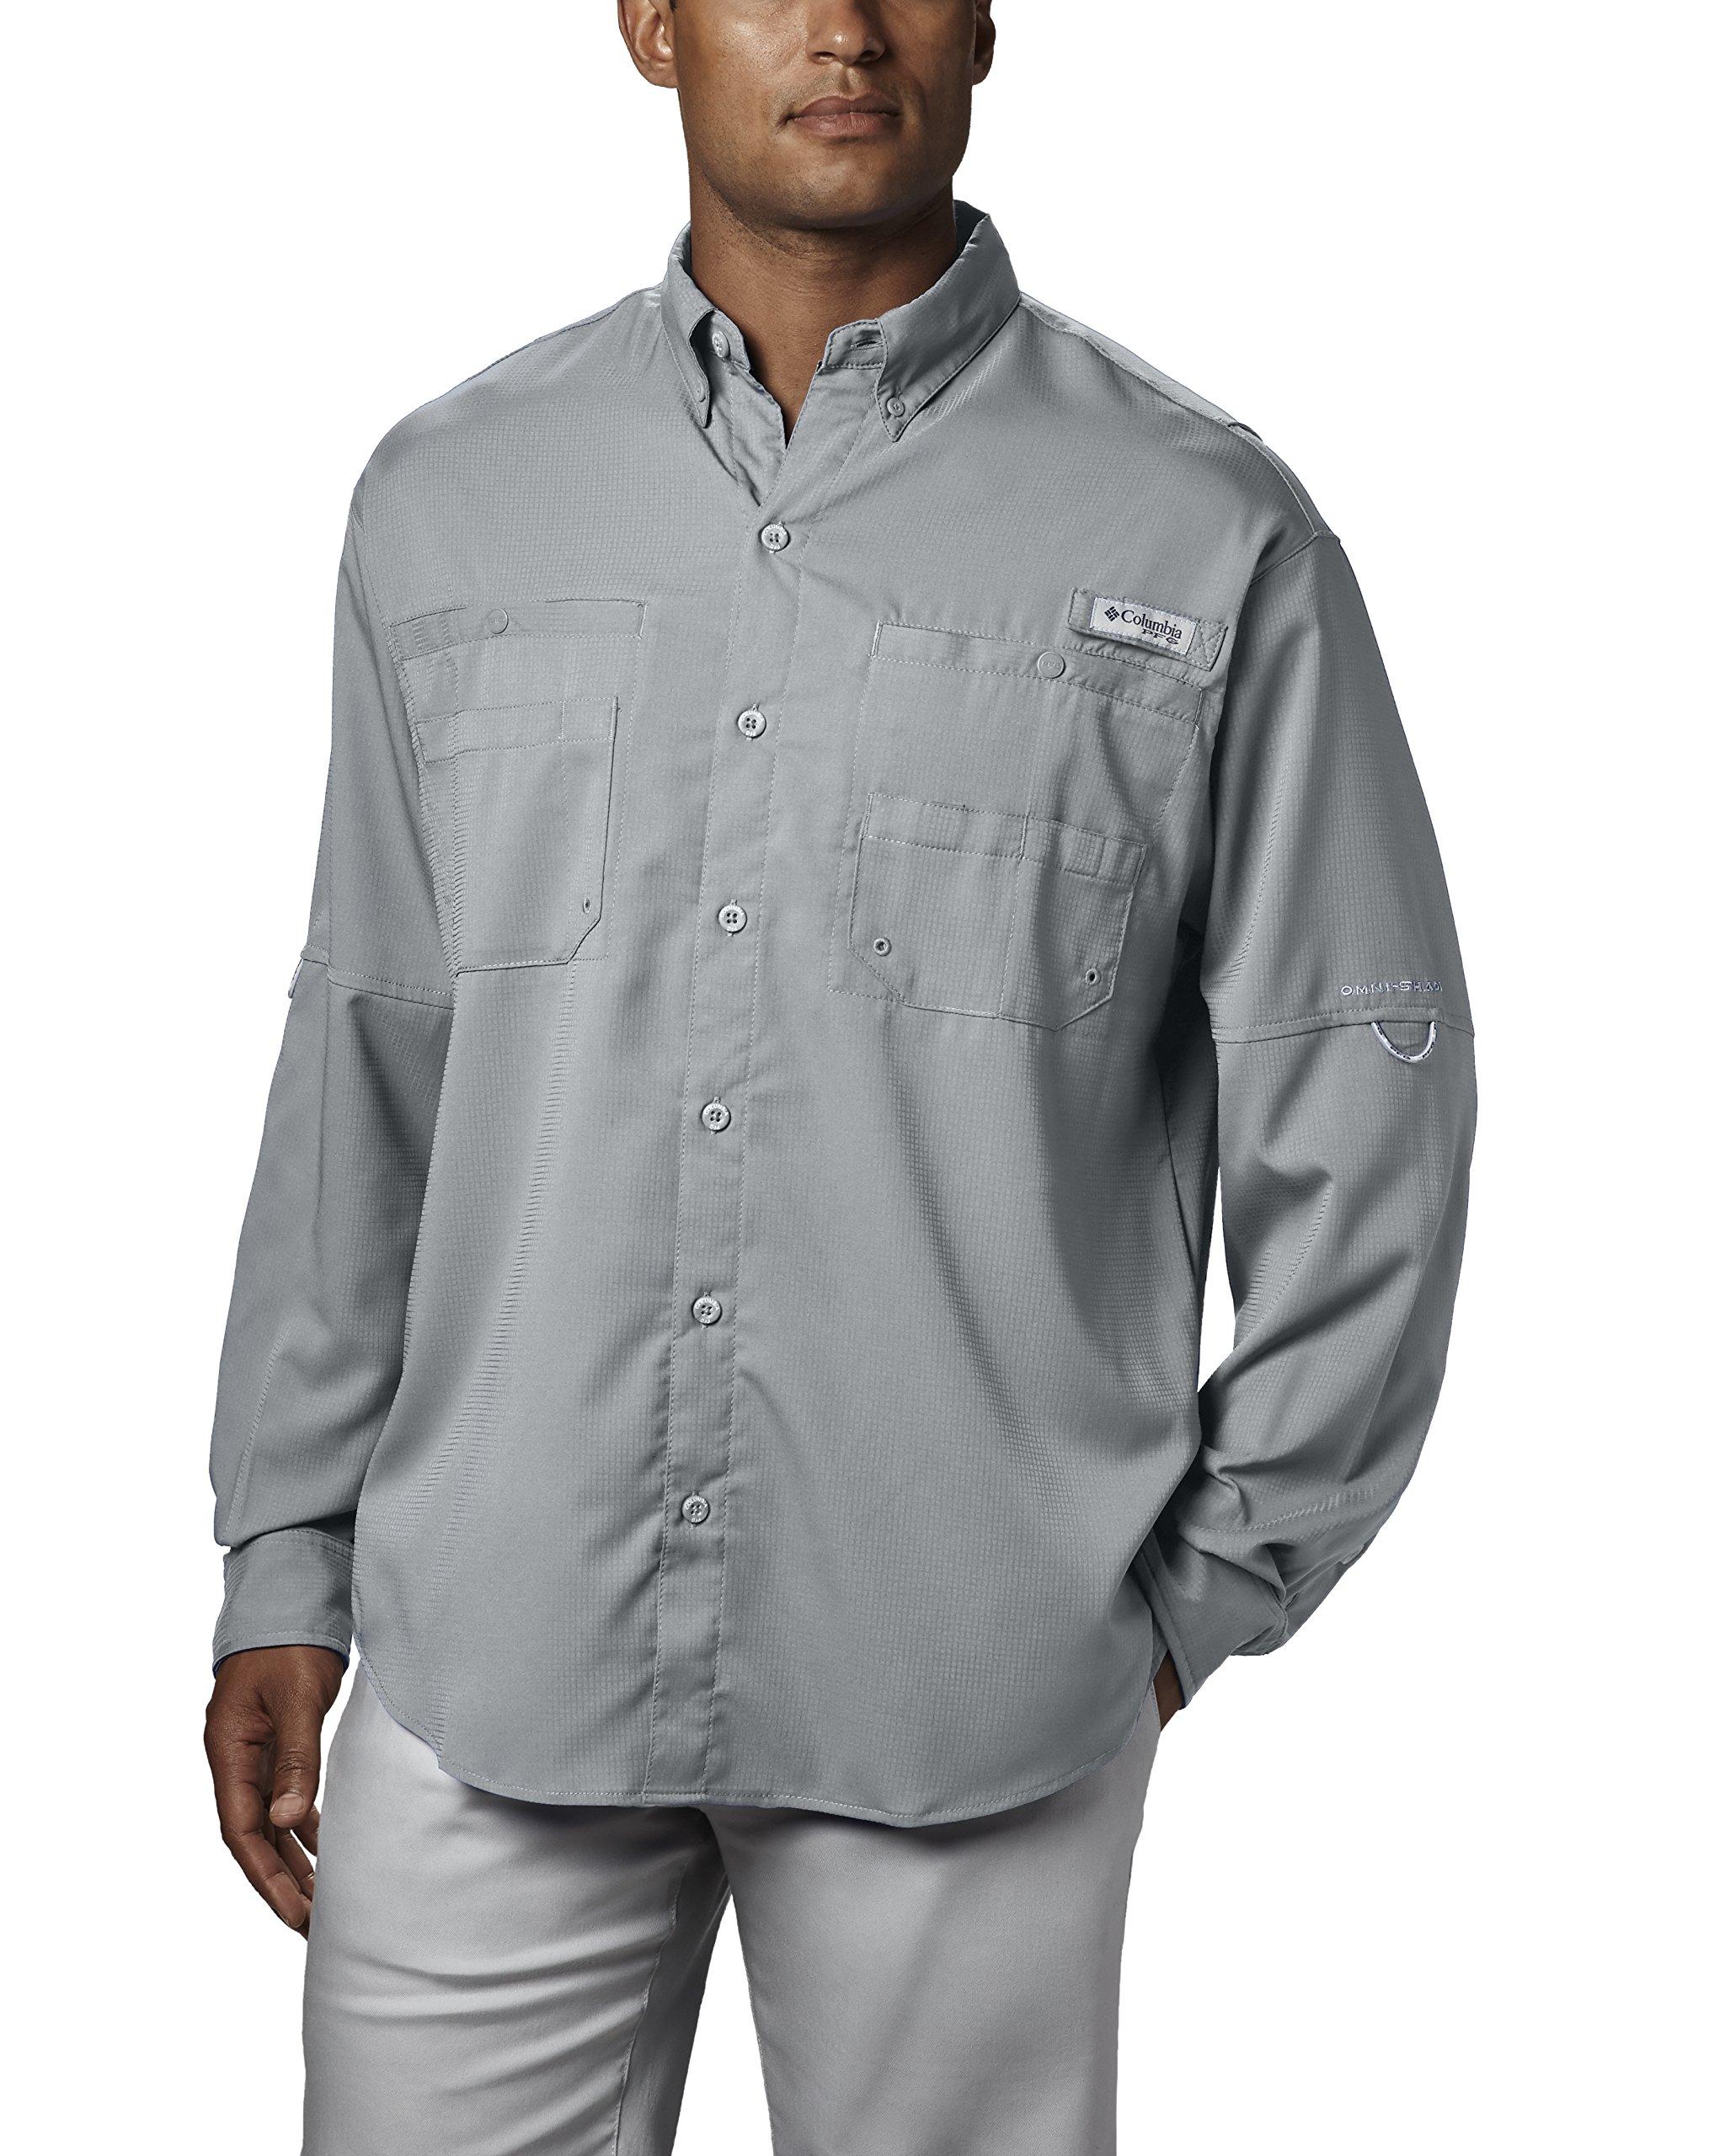 Columbia Men's Plus Tamiami II Long Sleeve Shirt, Cool Grey - X-Small